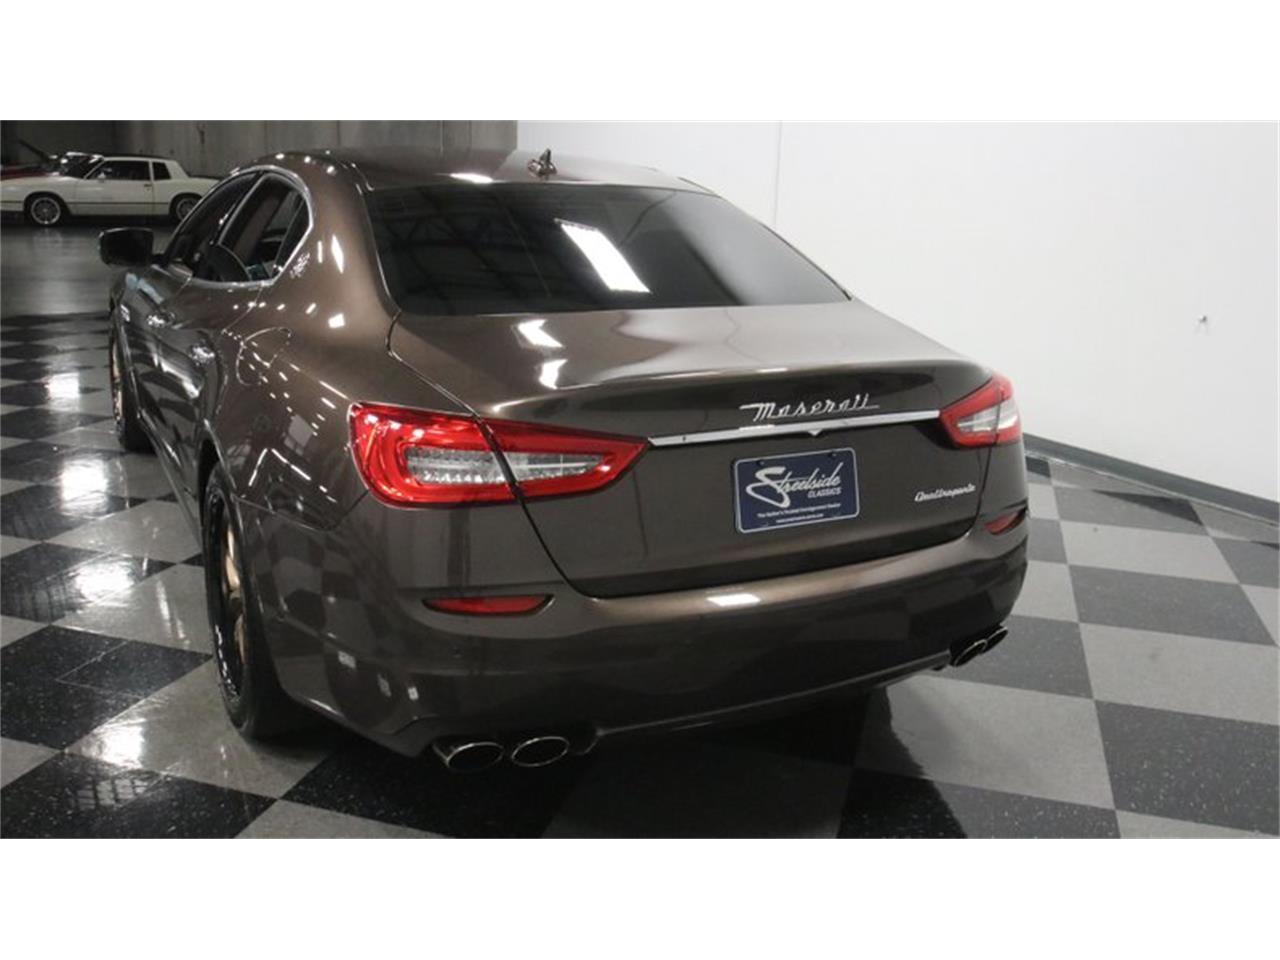 2016 Maserati Quattroporte (CC-1418454) for sale in Lithia Springs, Georgia